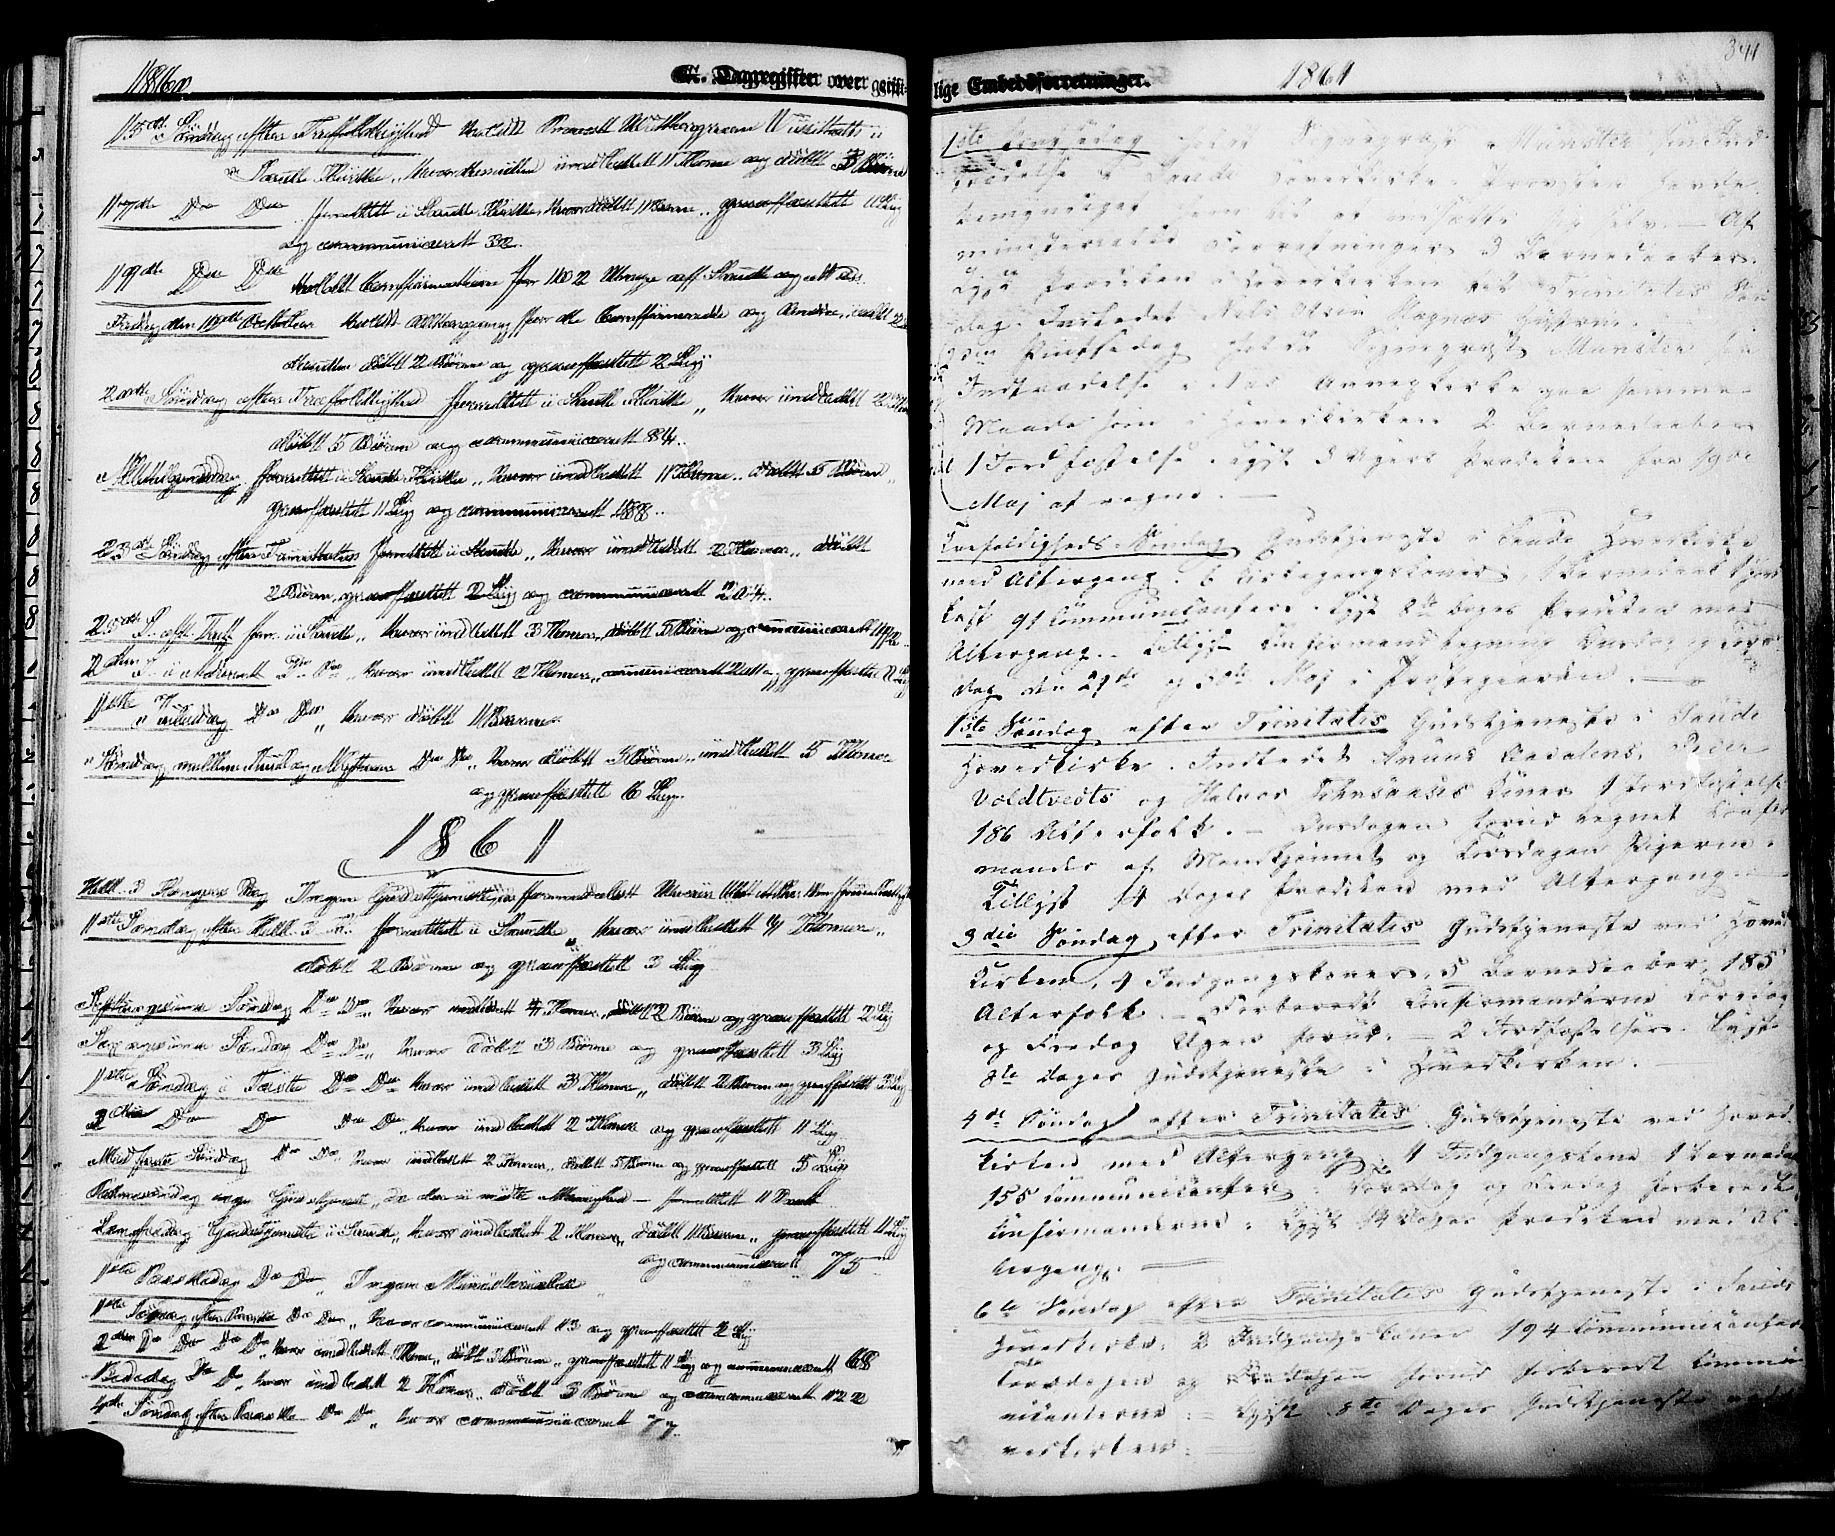 SAKO, Sauherad kirkebøker, F/Fa/L0007: Ministerialbok nr. I 7, 1851-1873, s. 341